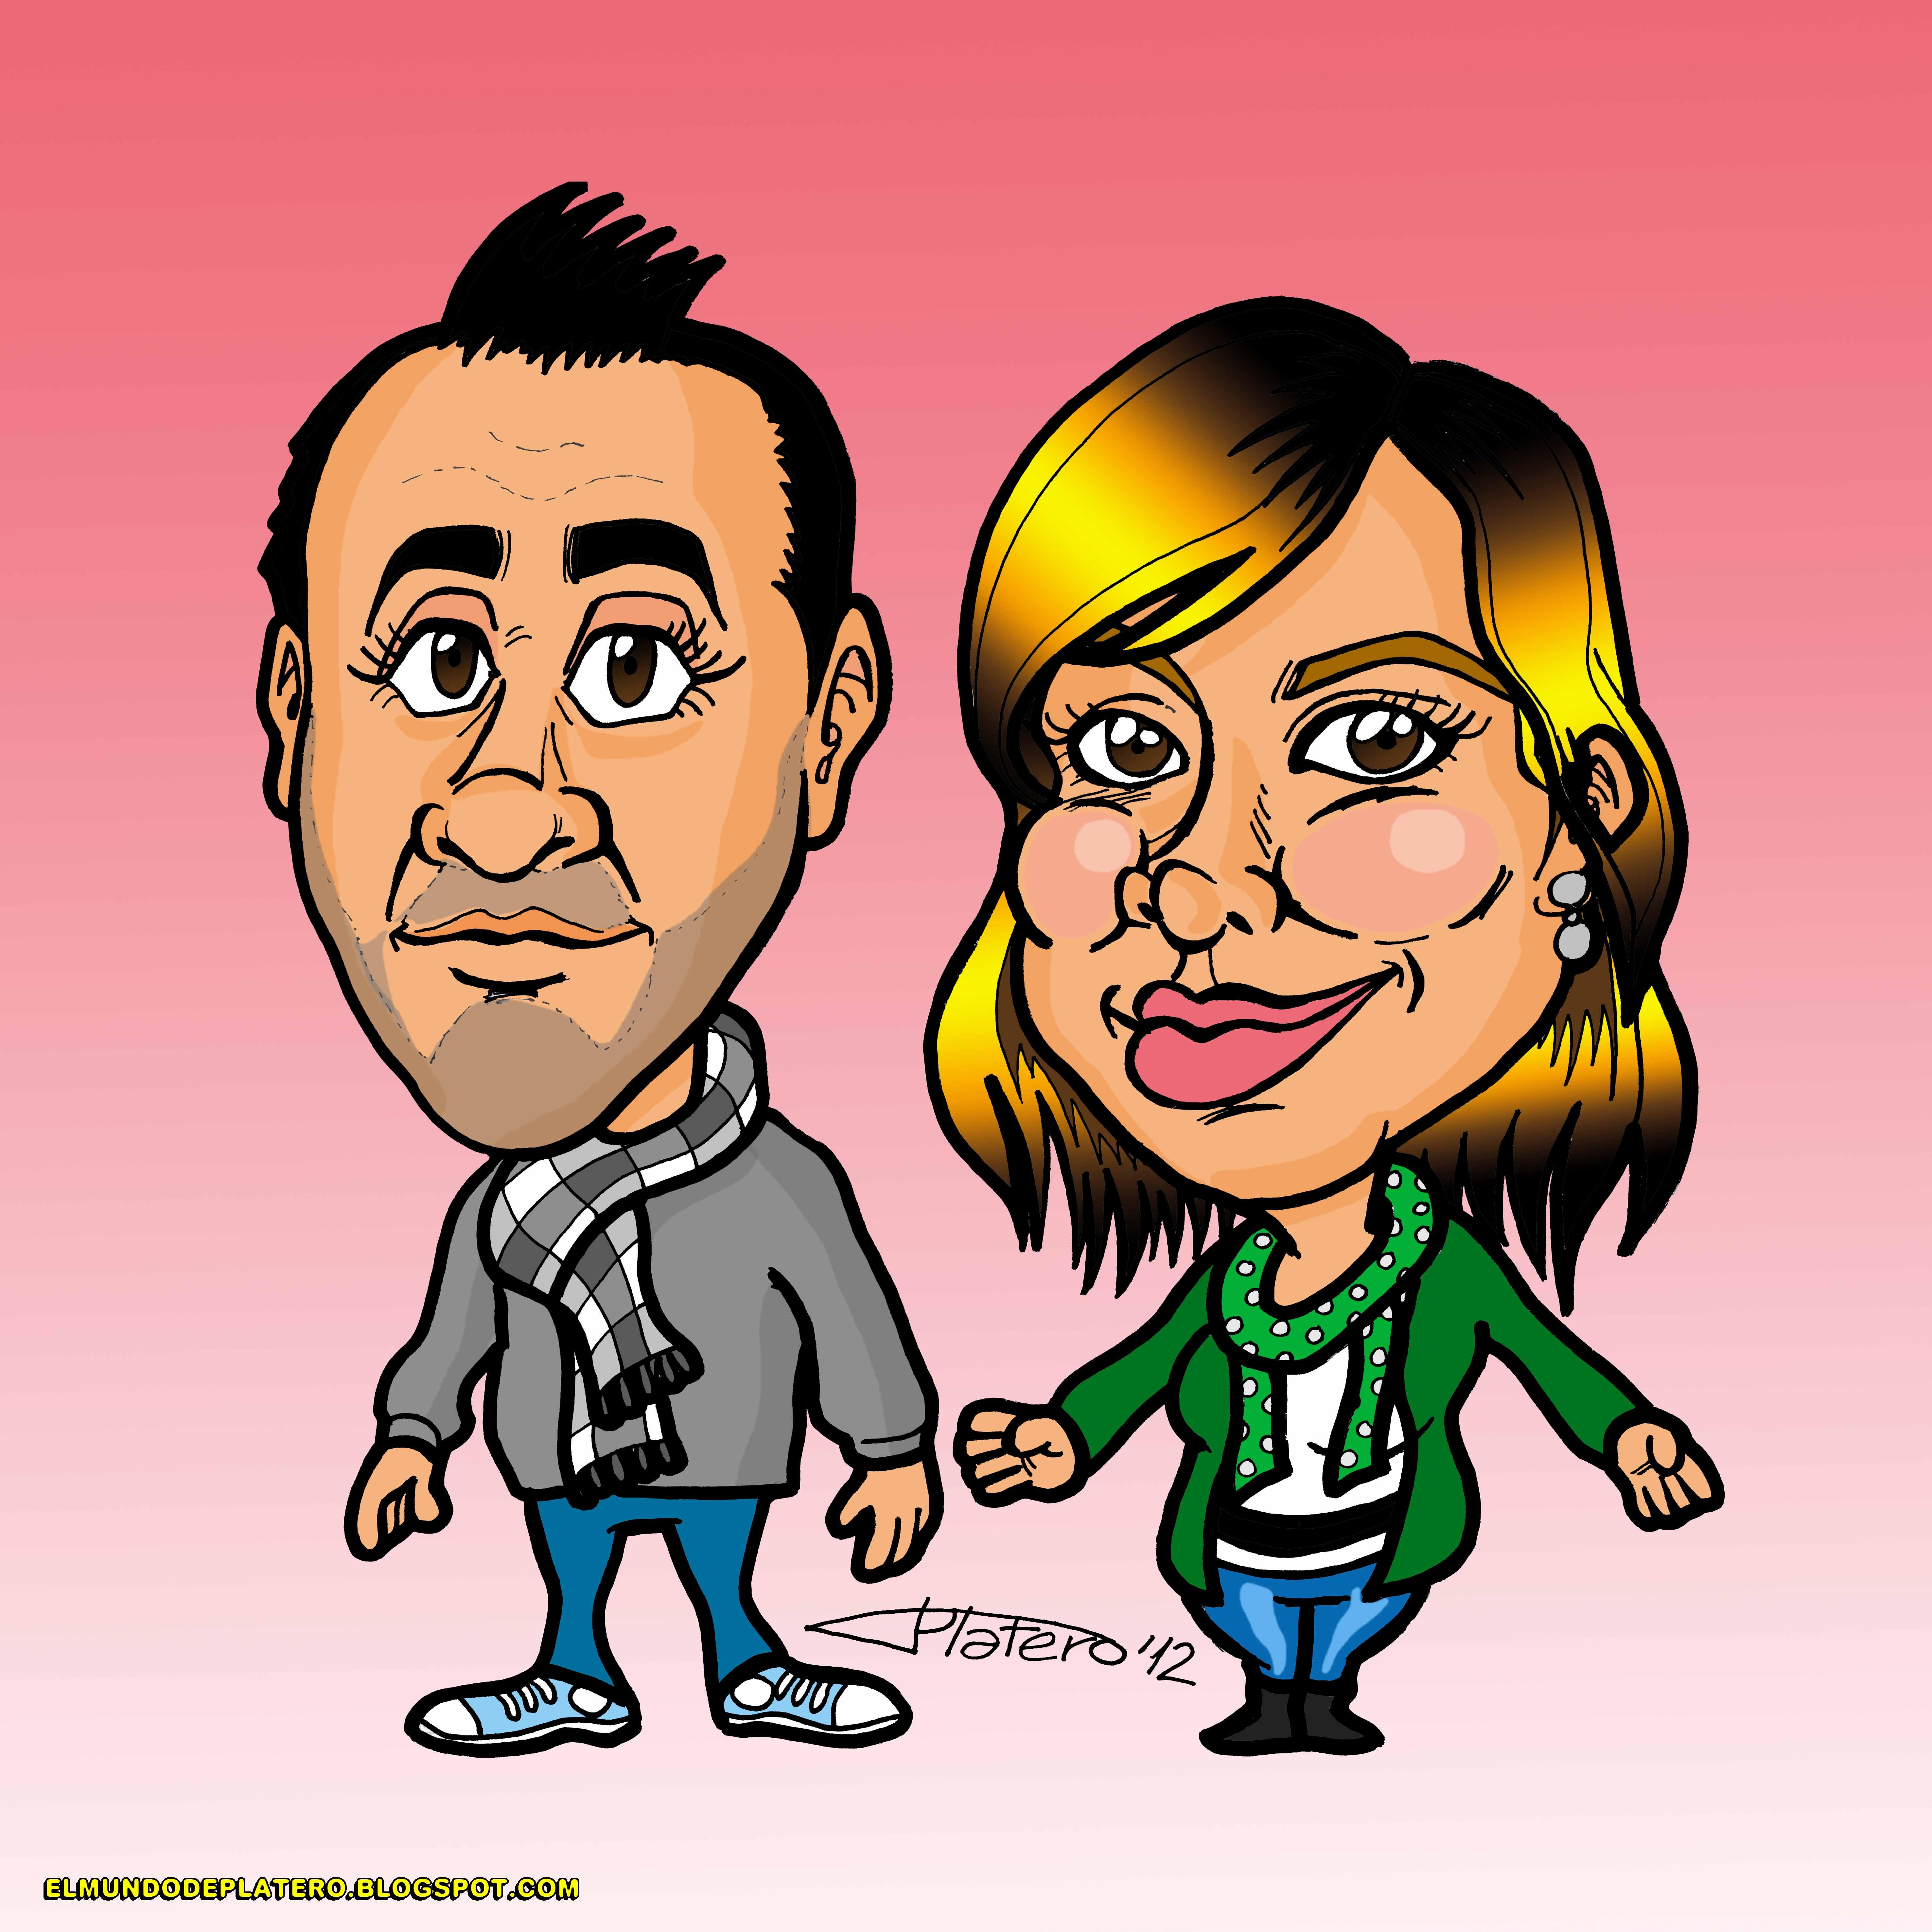 caricaturas a color por encargo_novios_elmundodeplatero_josé luis platero.jpg